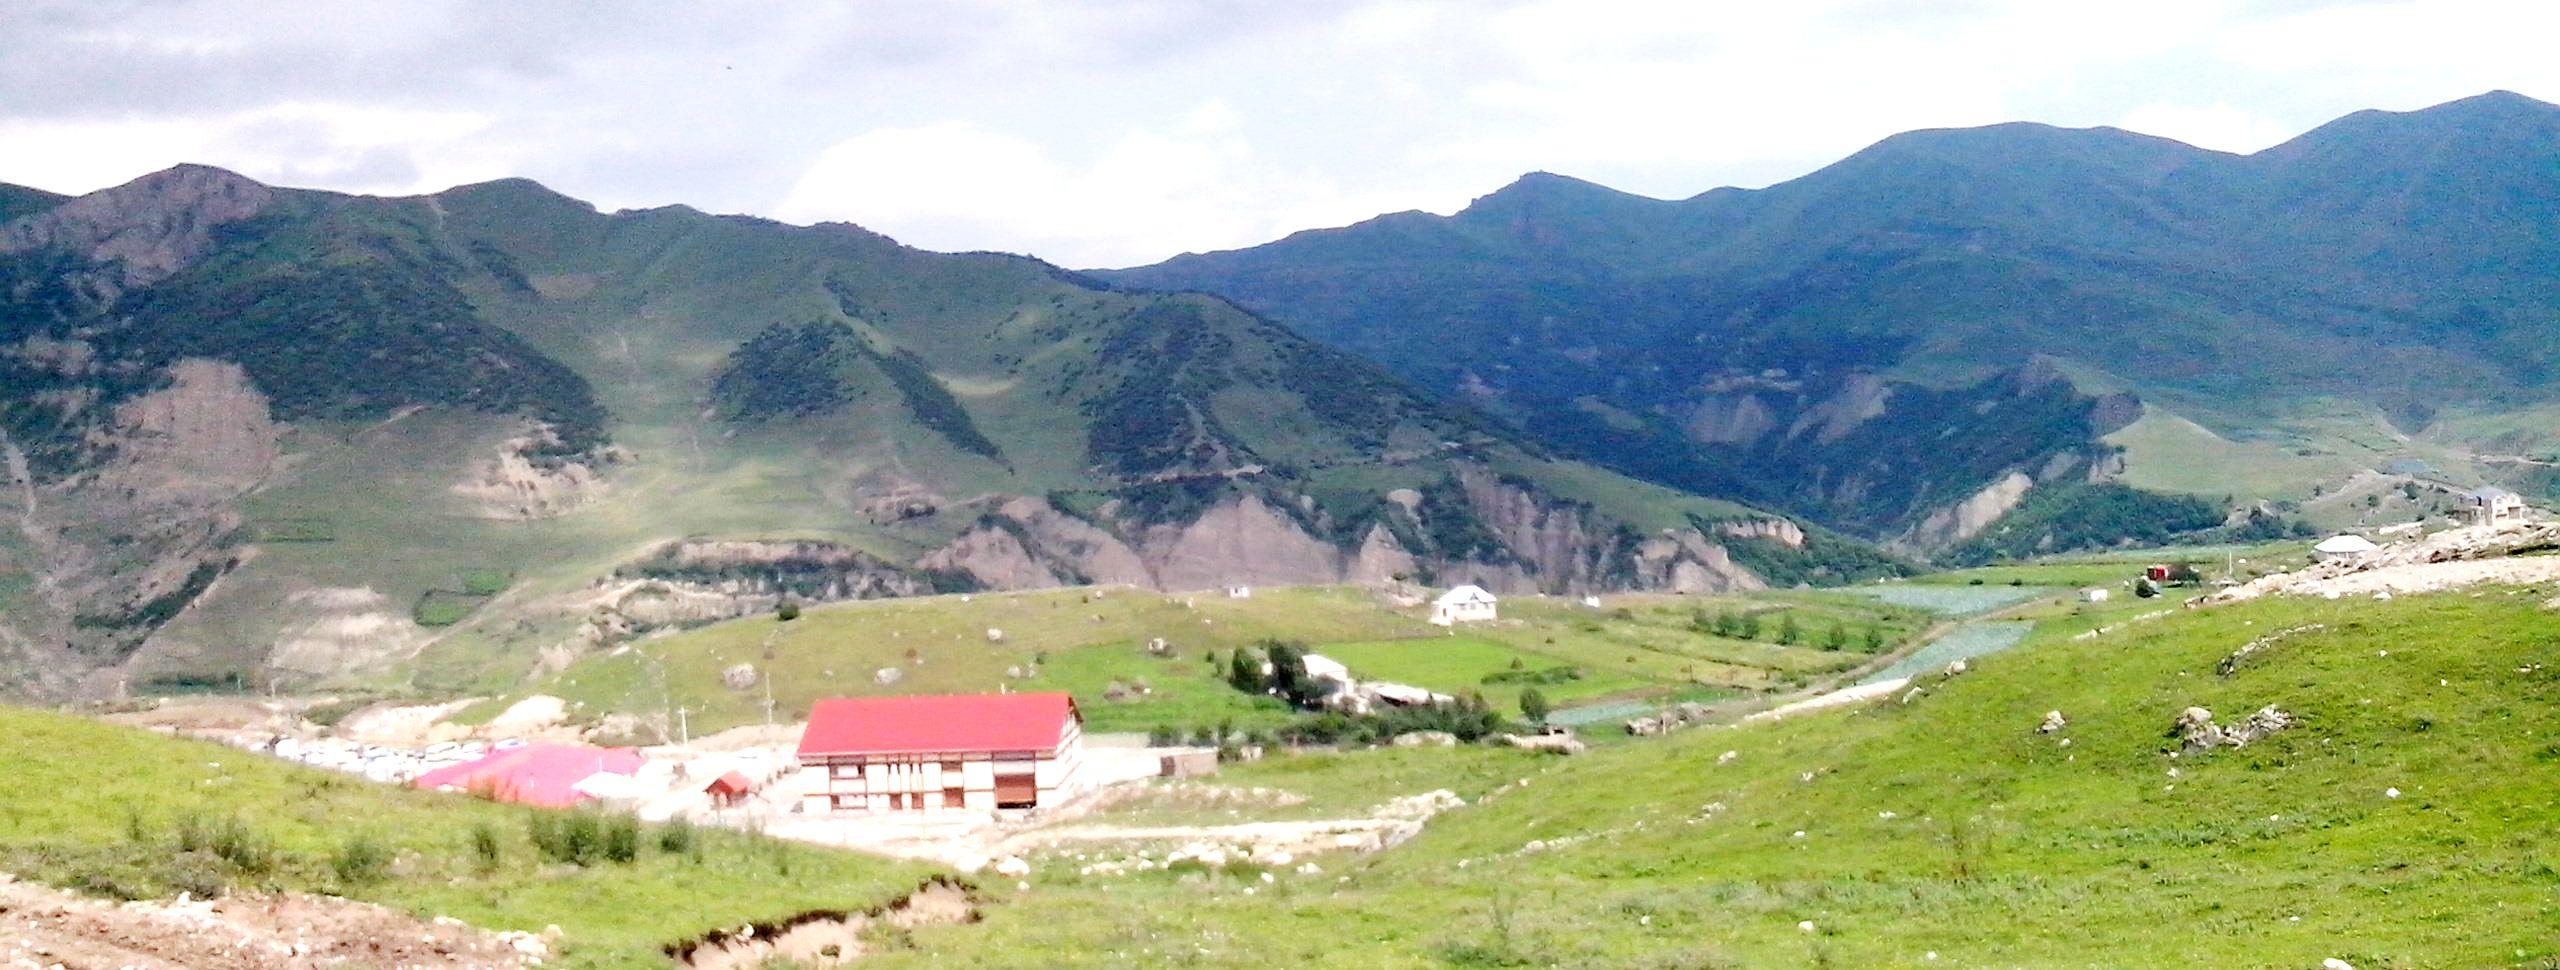 QUSAR - LAZA - QUBA